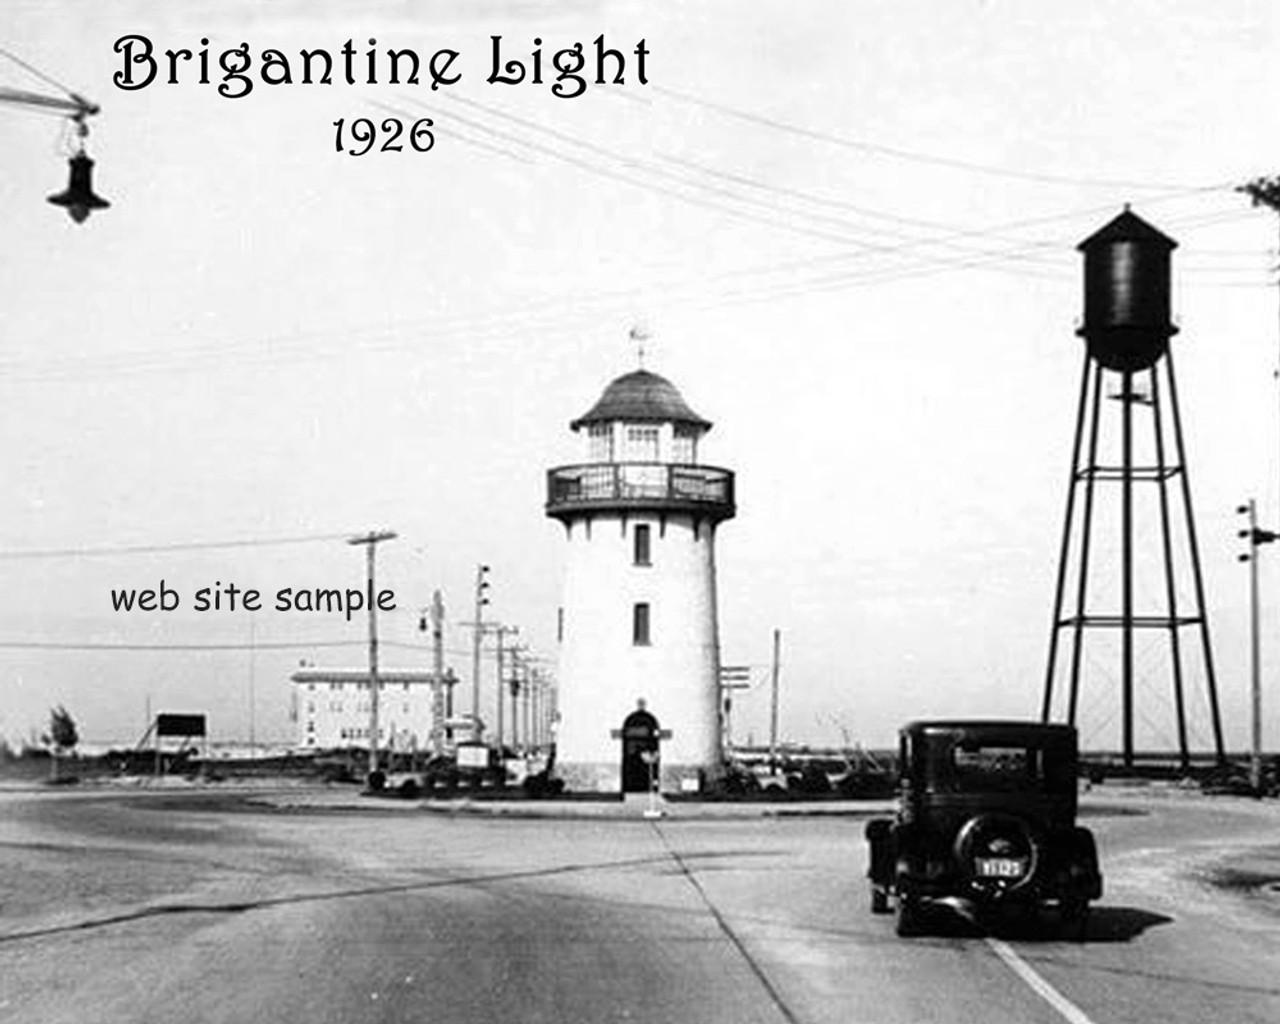 Brigantine Lighthouse